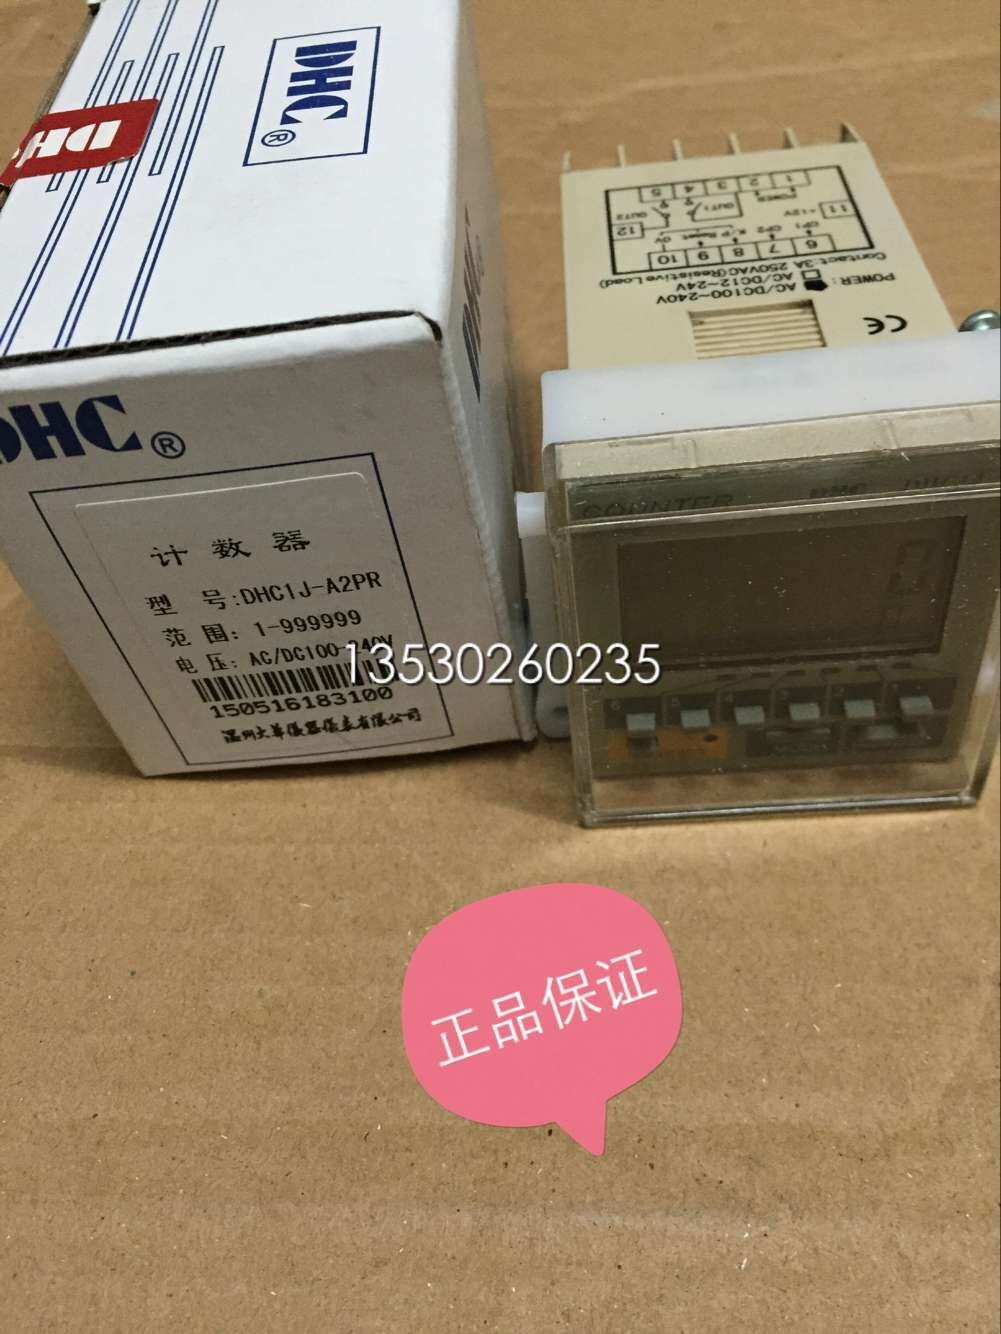 DHC1J-A2PR DHC1J-ATR DHC1J-ABR  Photoelectric Switch dhc1j a2pr dhc1j atr dhc1j abr photoelectric switch